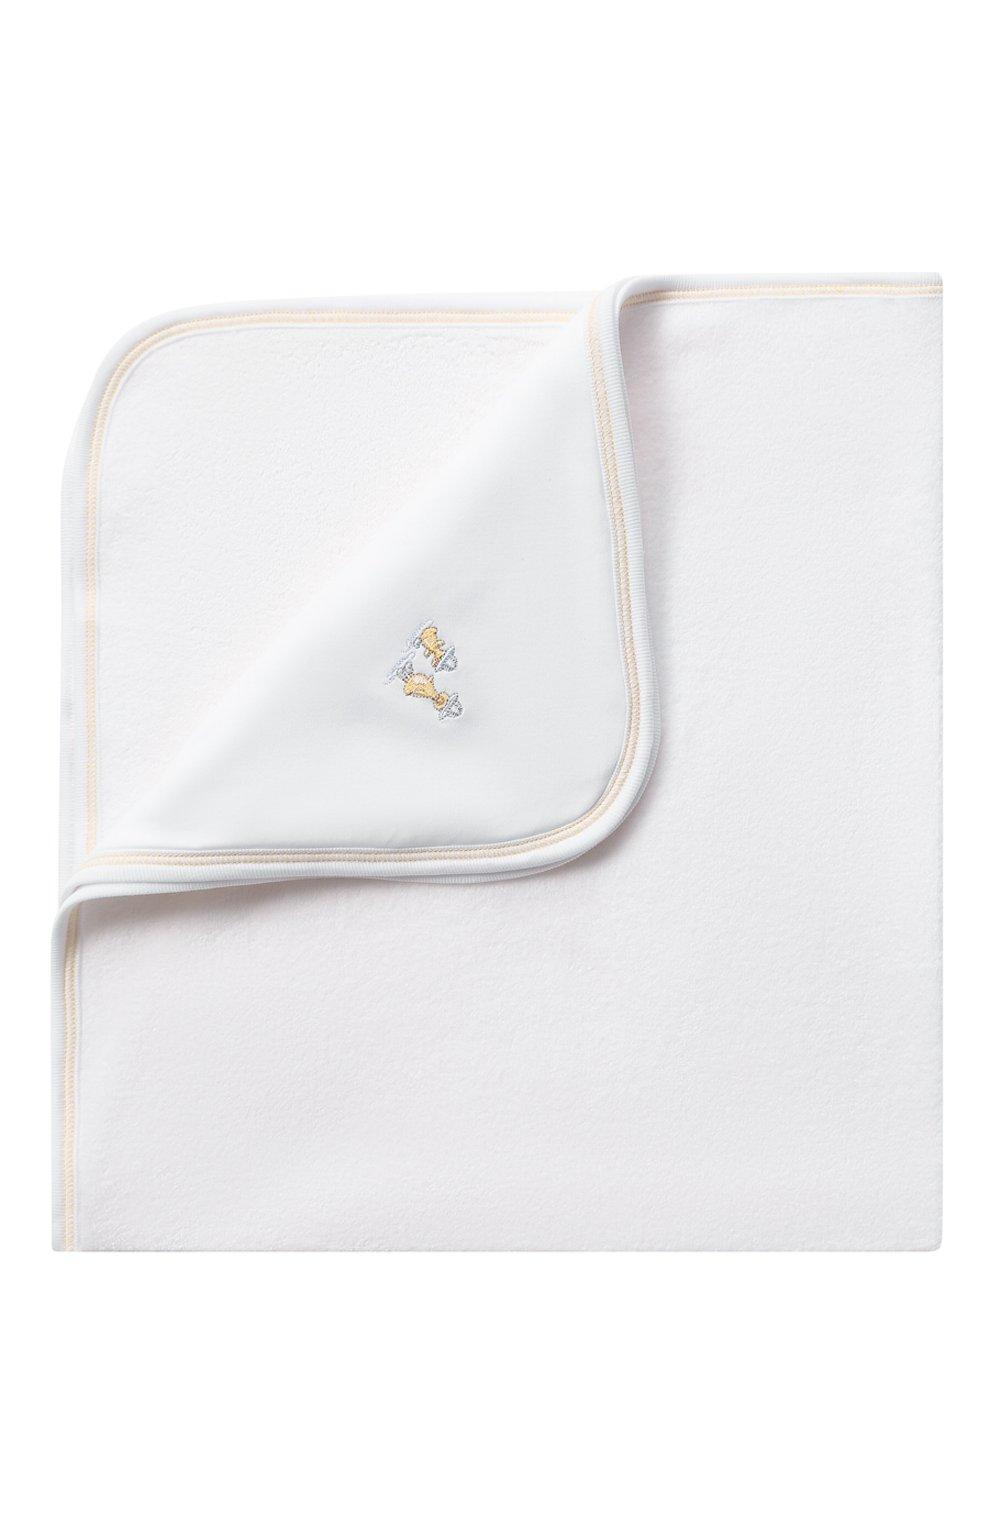 Детского комплект из полотенца и рукавицы KISSY KISSY белого цвета, арт. KN403463O | Фото 4 (Материал: Текстиль, Хлопок)